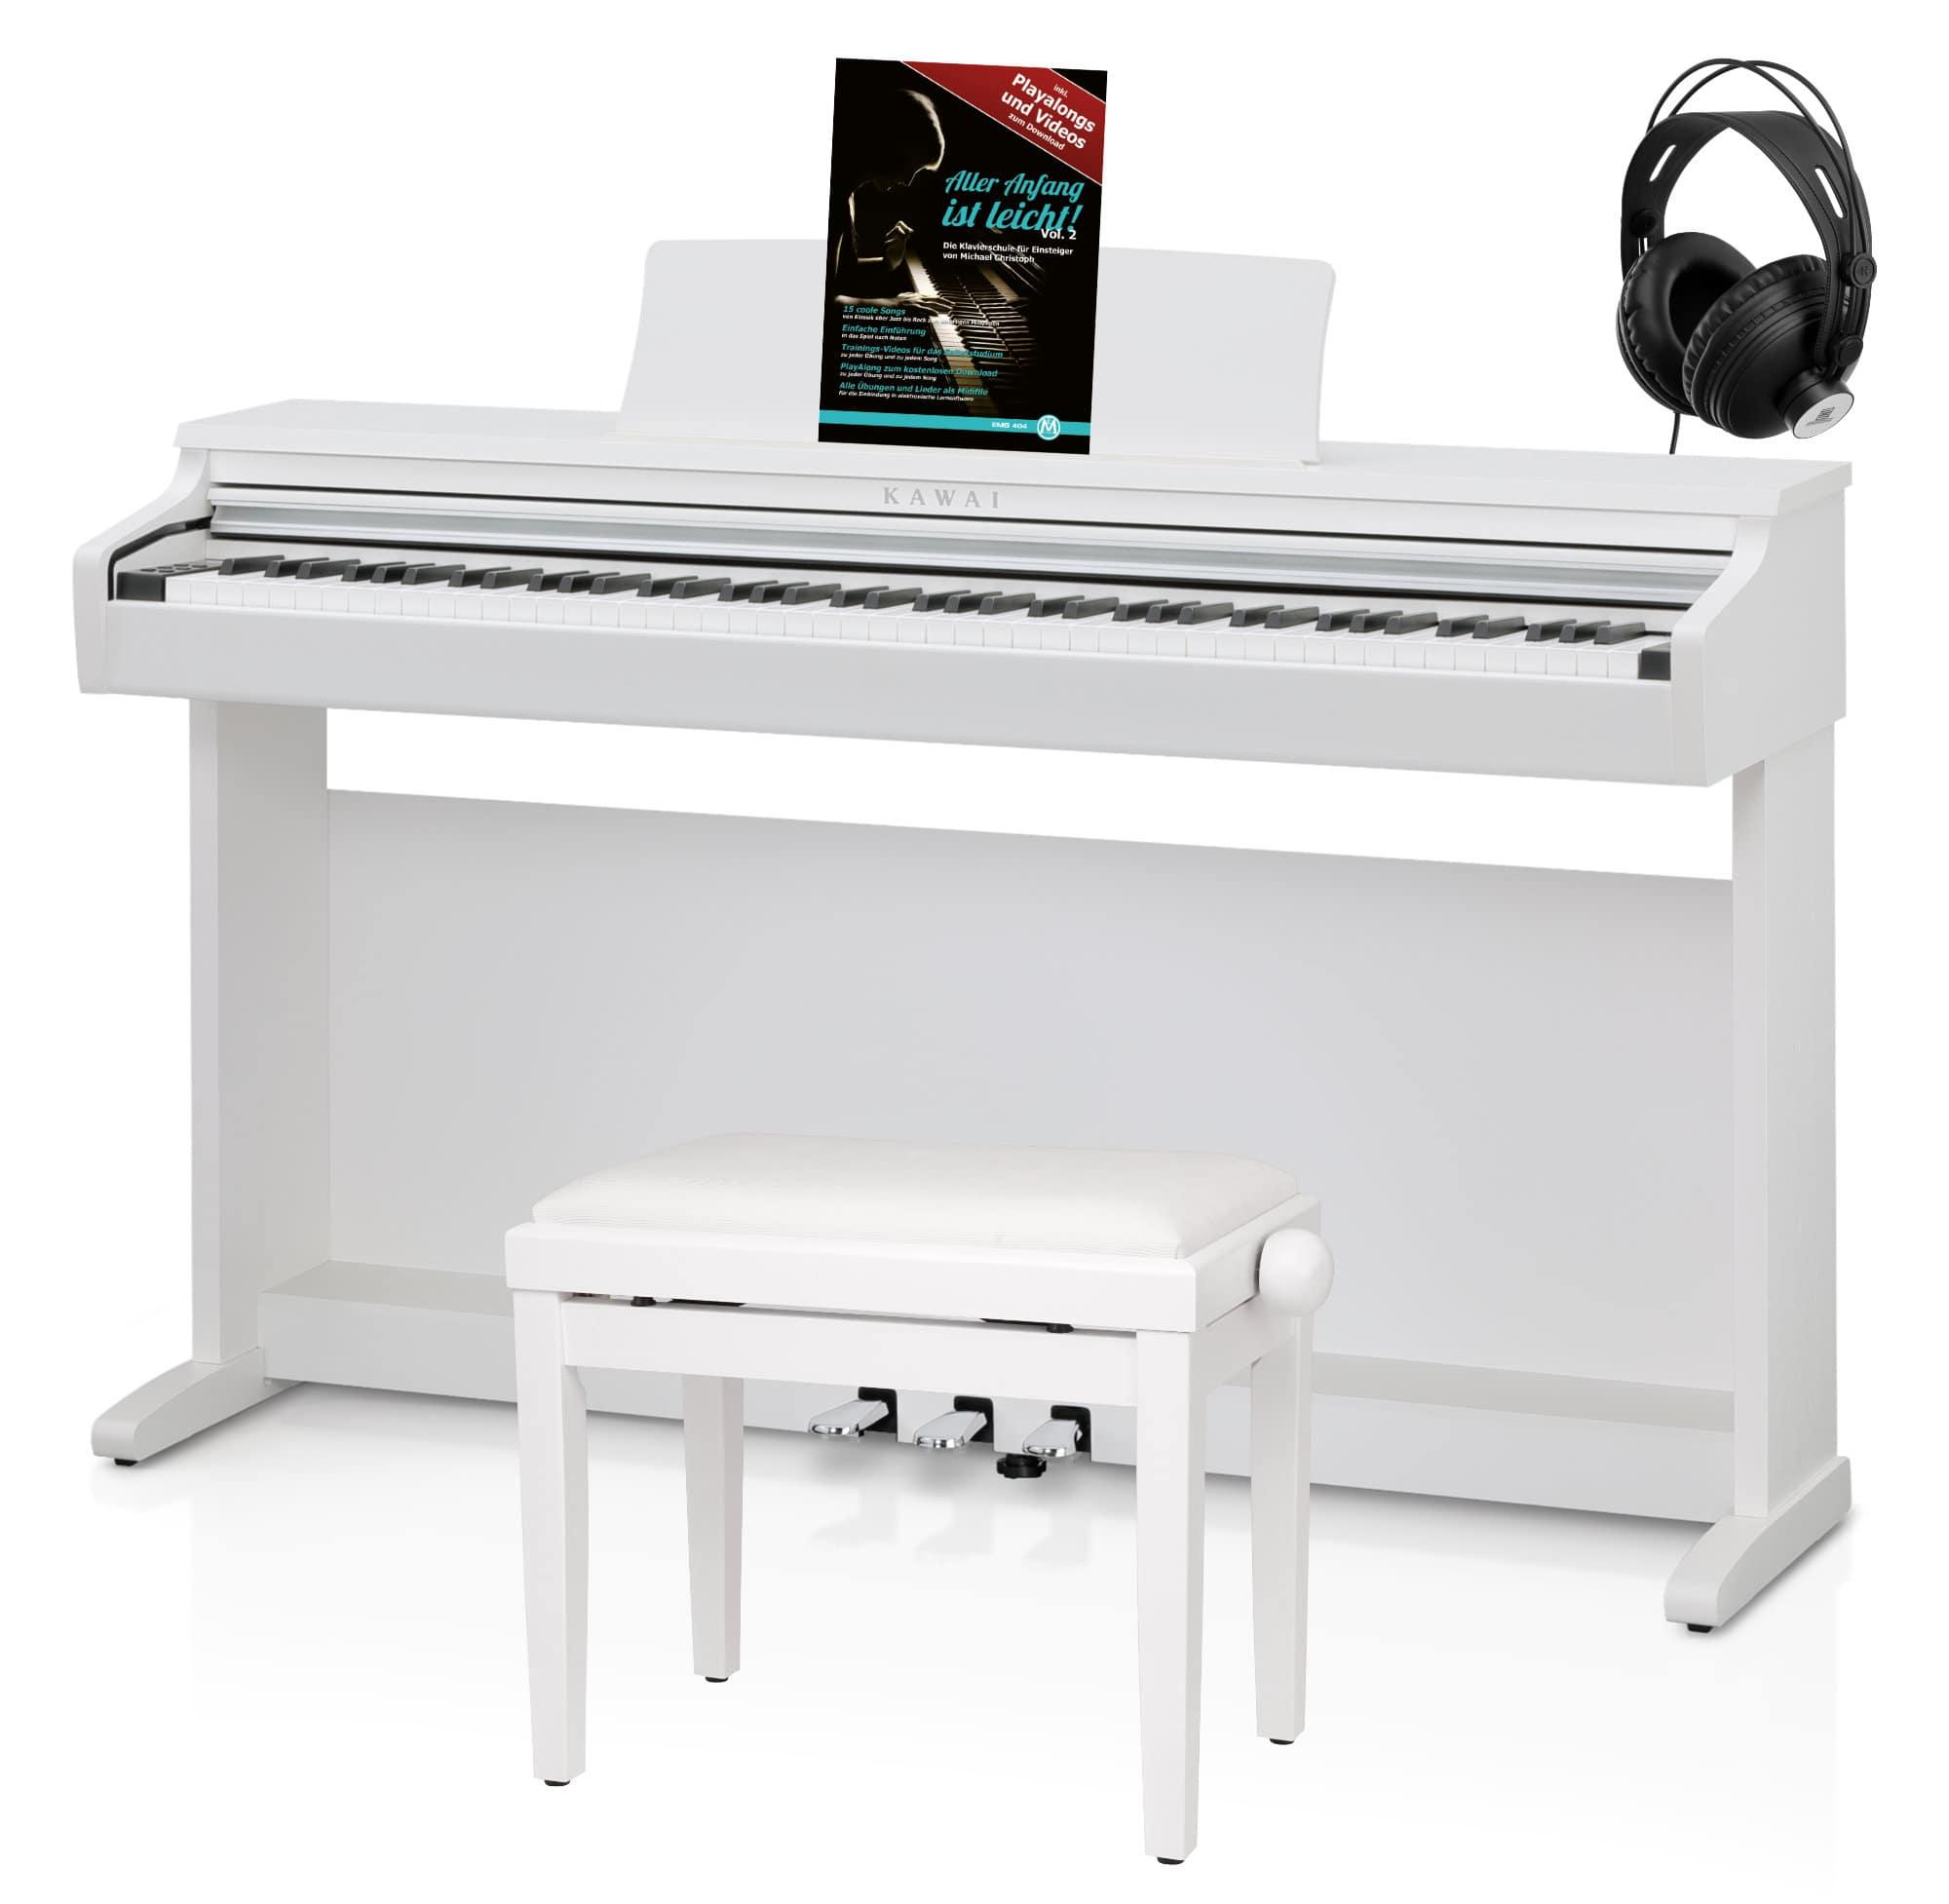 Digitalpianos - Kawai KDP120 W Digitalpiano Premium Weiß satiniert Set - Onlineshop Musikhaus Kirstein